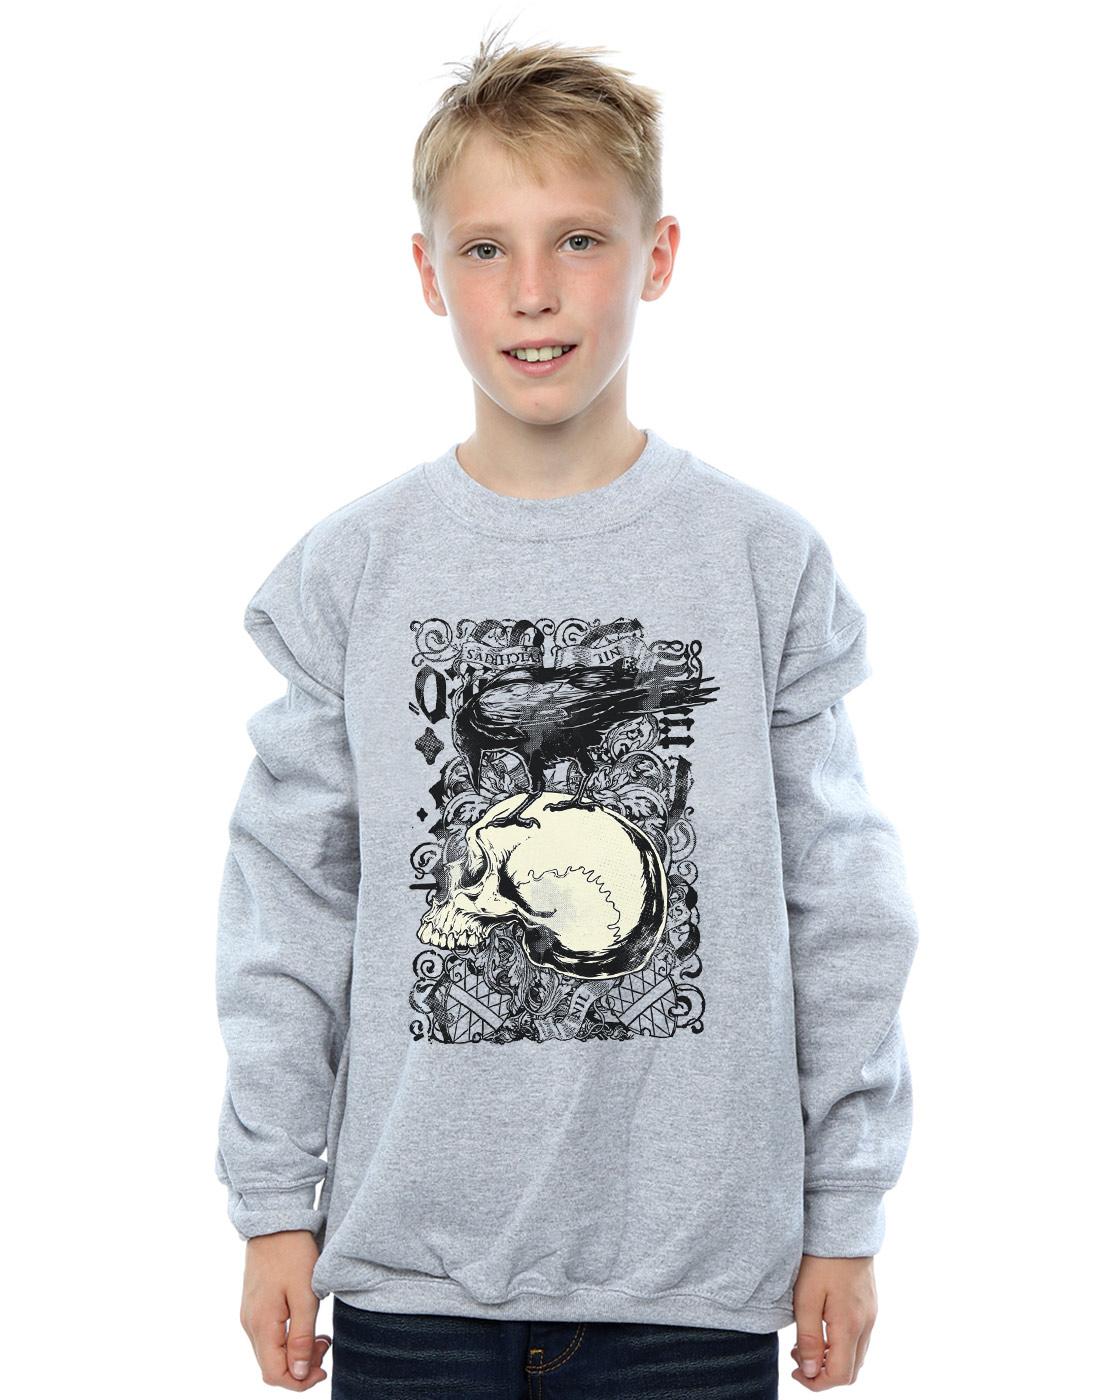 Absolute Cult Drewbacca Womens Crow Skull Sweatshirt